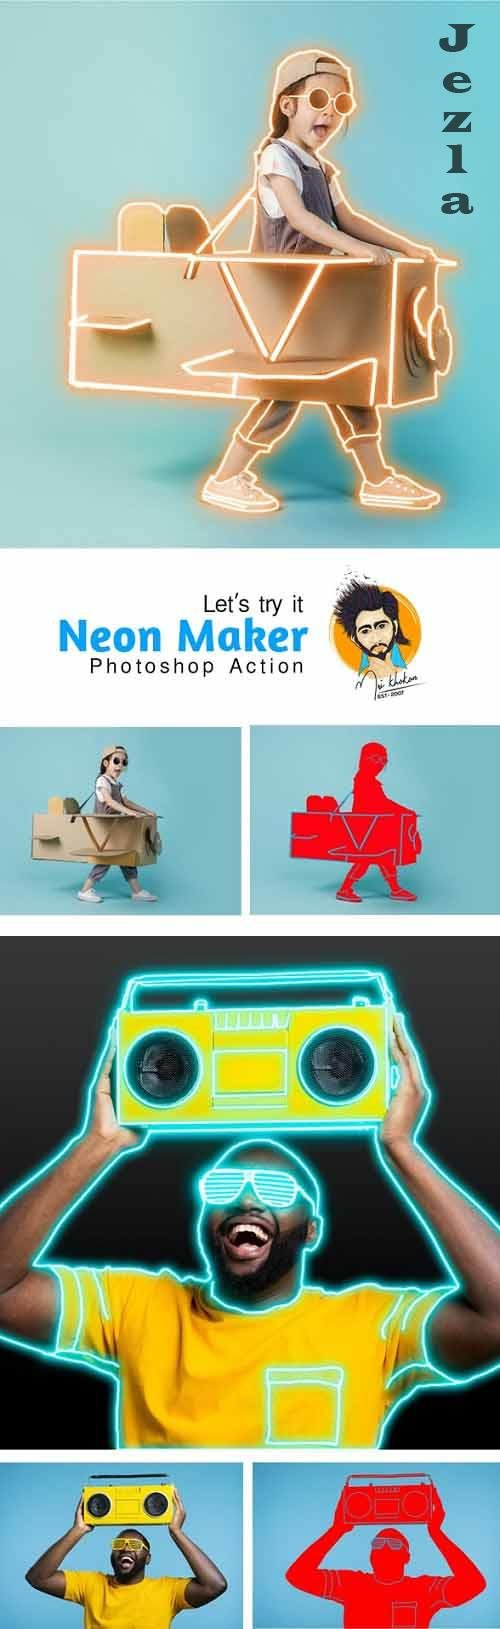 GraphicRiver - Neon Maker Photoshop Action 29732242